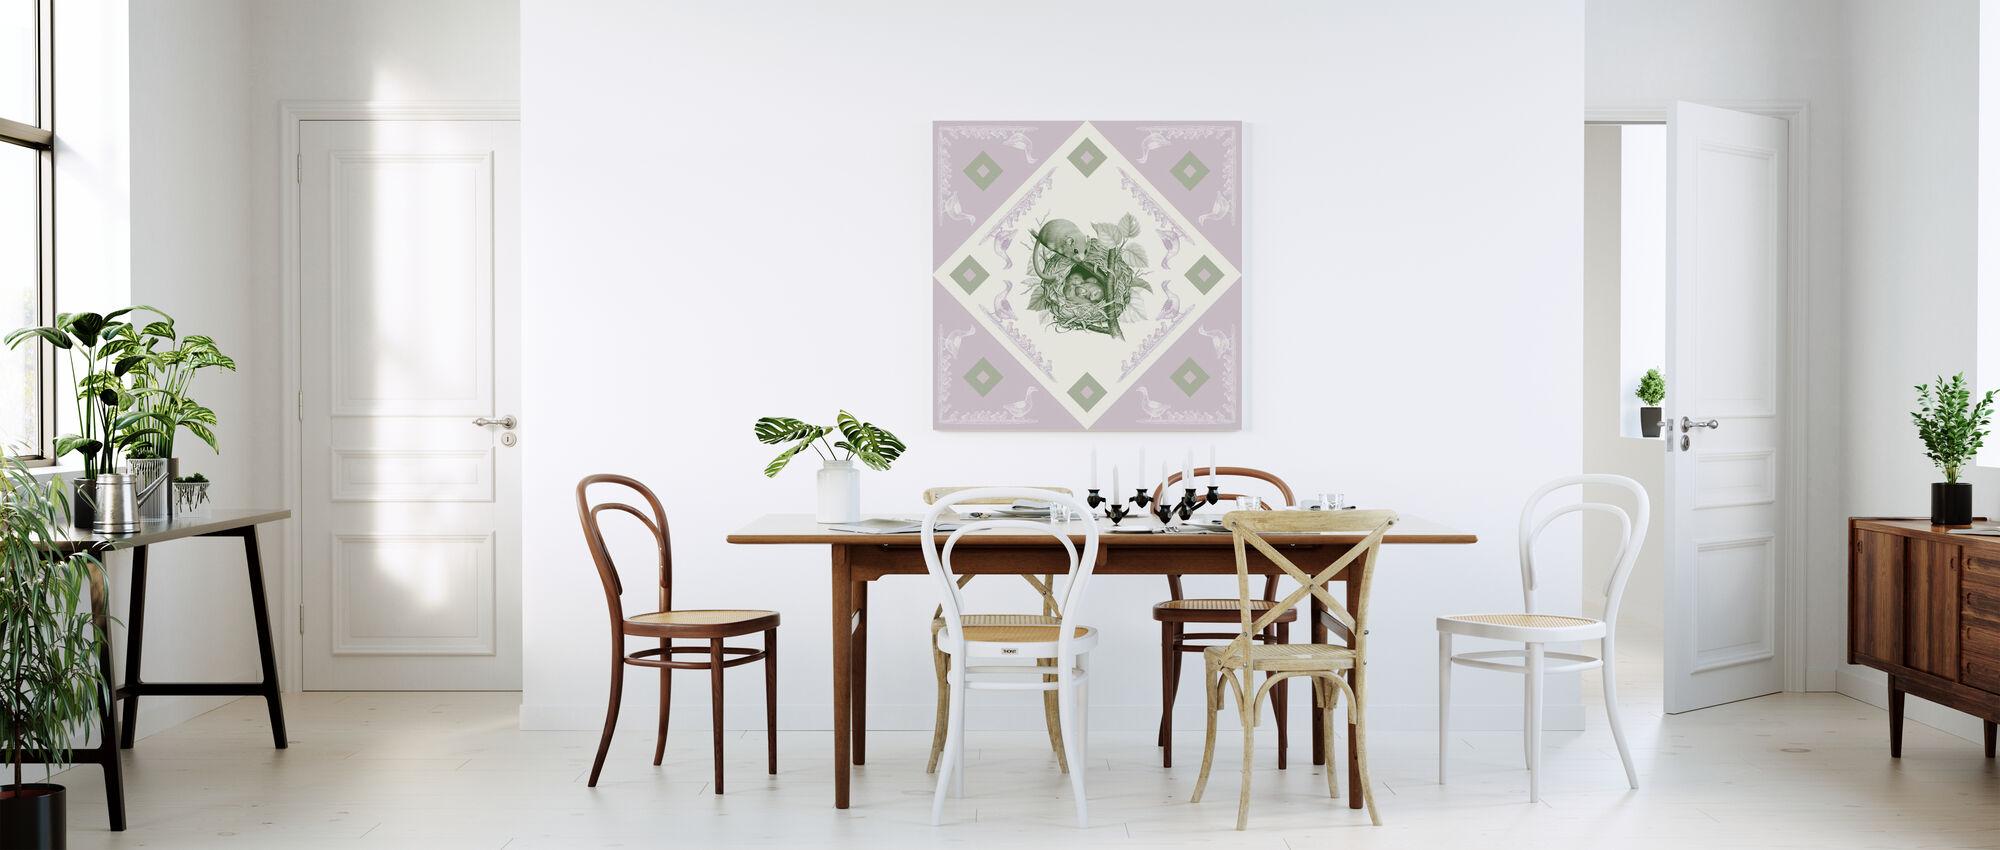 Dormouse, Green Pink - Canvas print - Kitchen